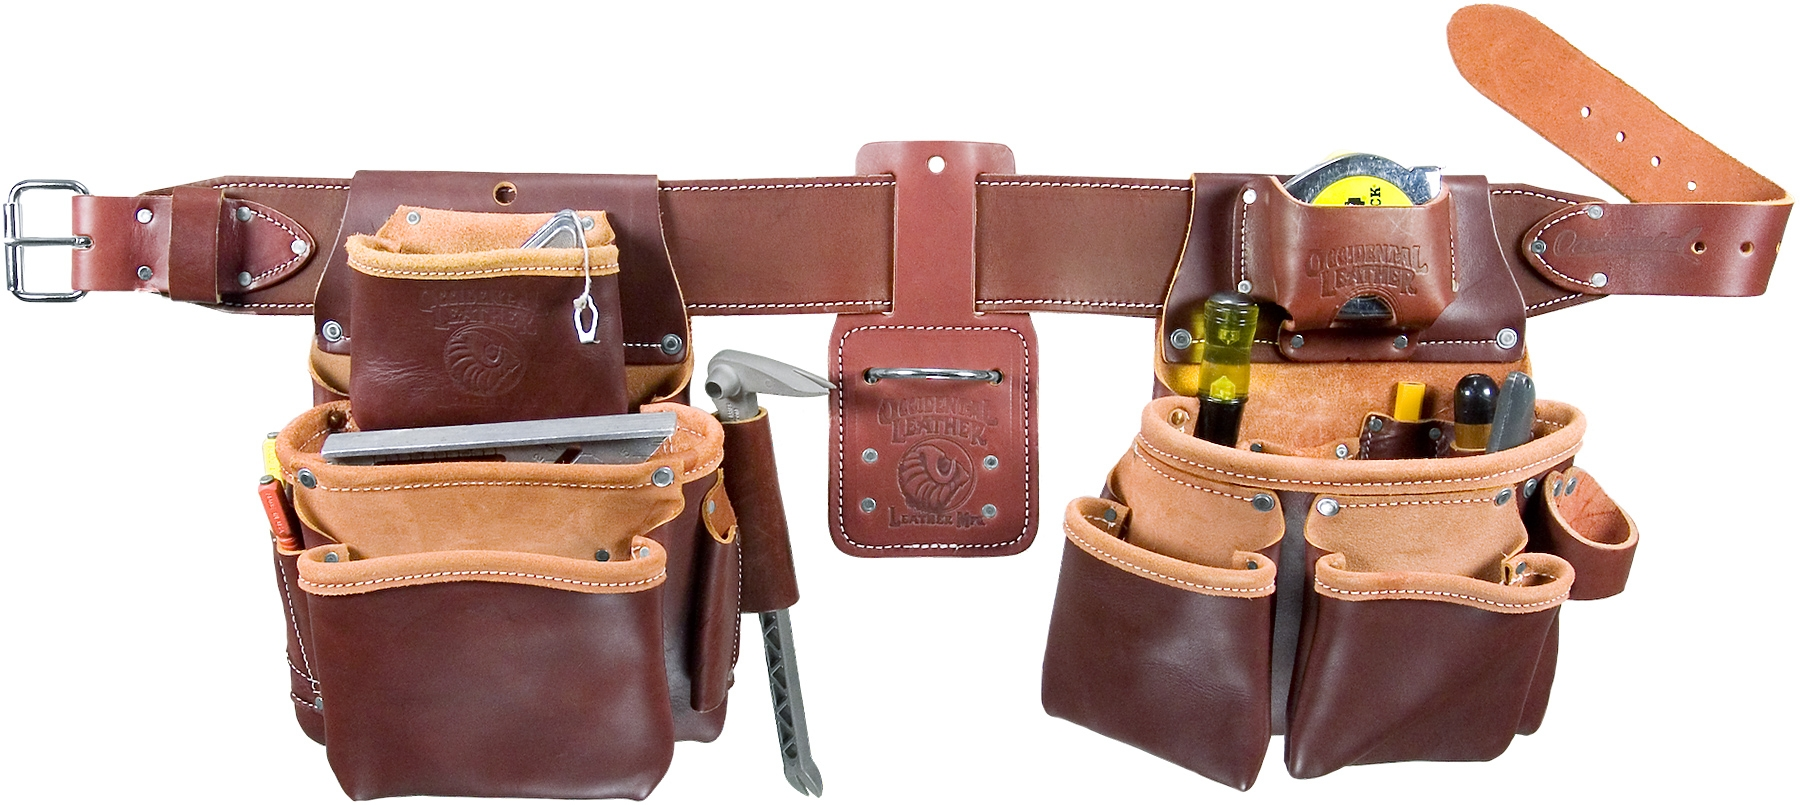 Tool Belts & Bags